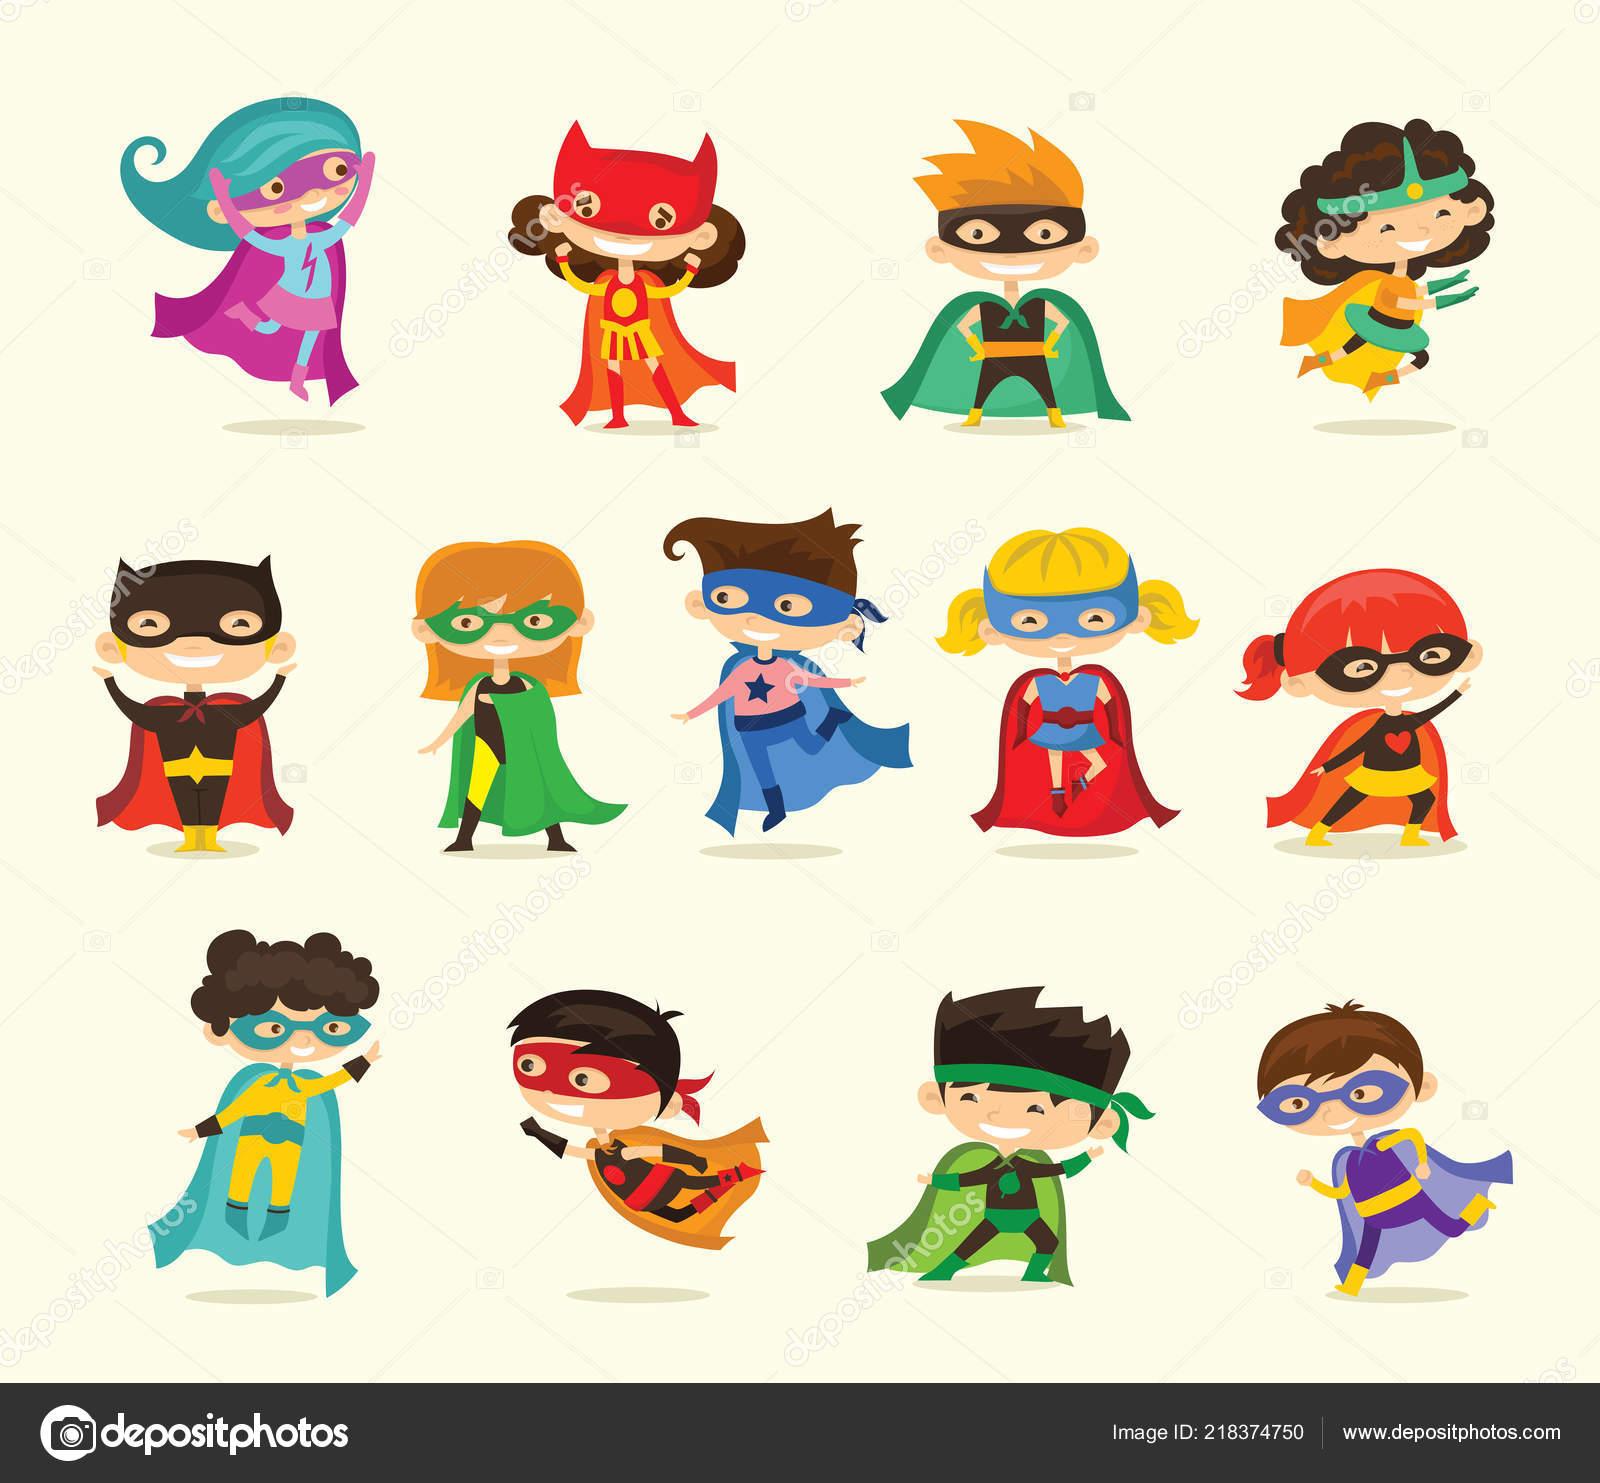 Dessin anim les enfants v tus costumes comics super h ros image vectorielle virinaflora - Comment dessiner un super heros fille ...